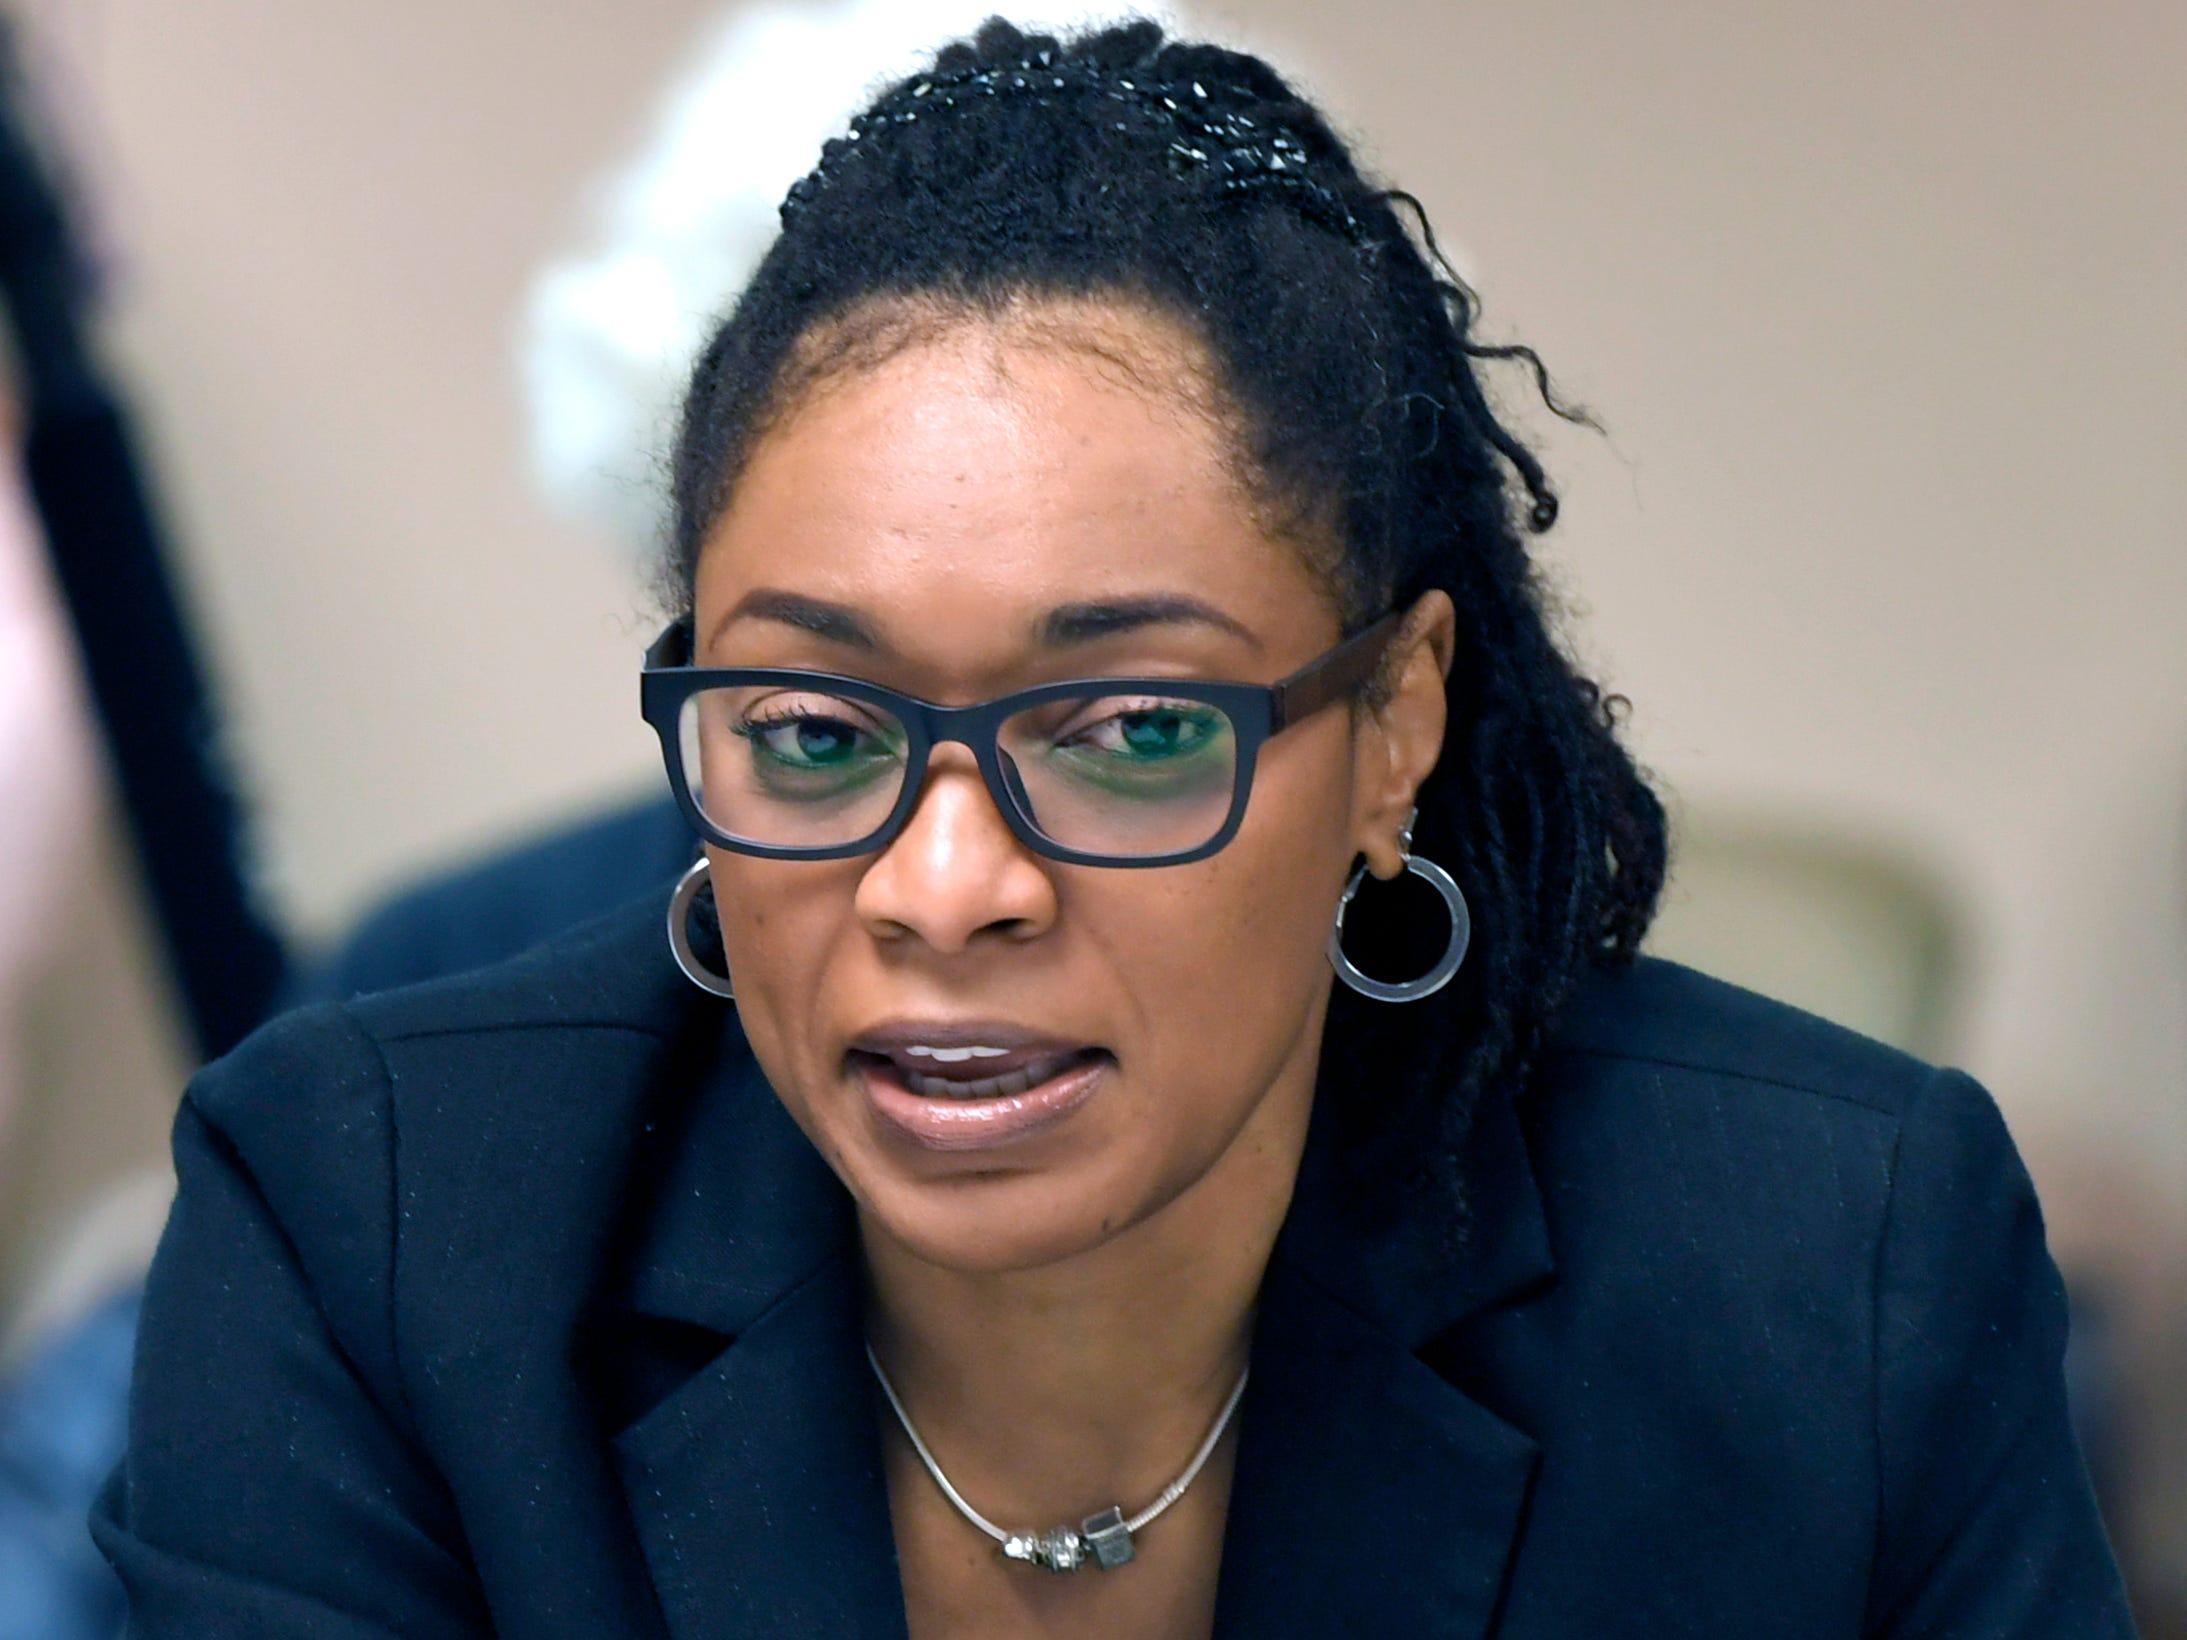 Nashville's Community Oversight Board member Danita Marsh attends first meeting on Tuesday, Feb. 12, 2019.